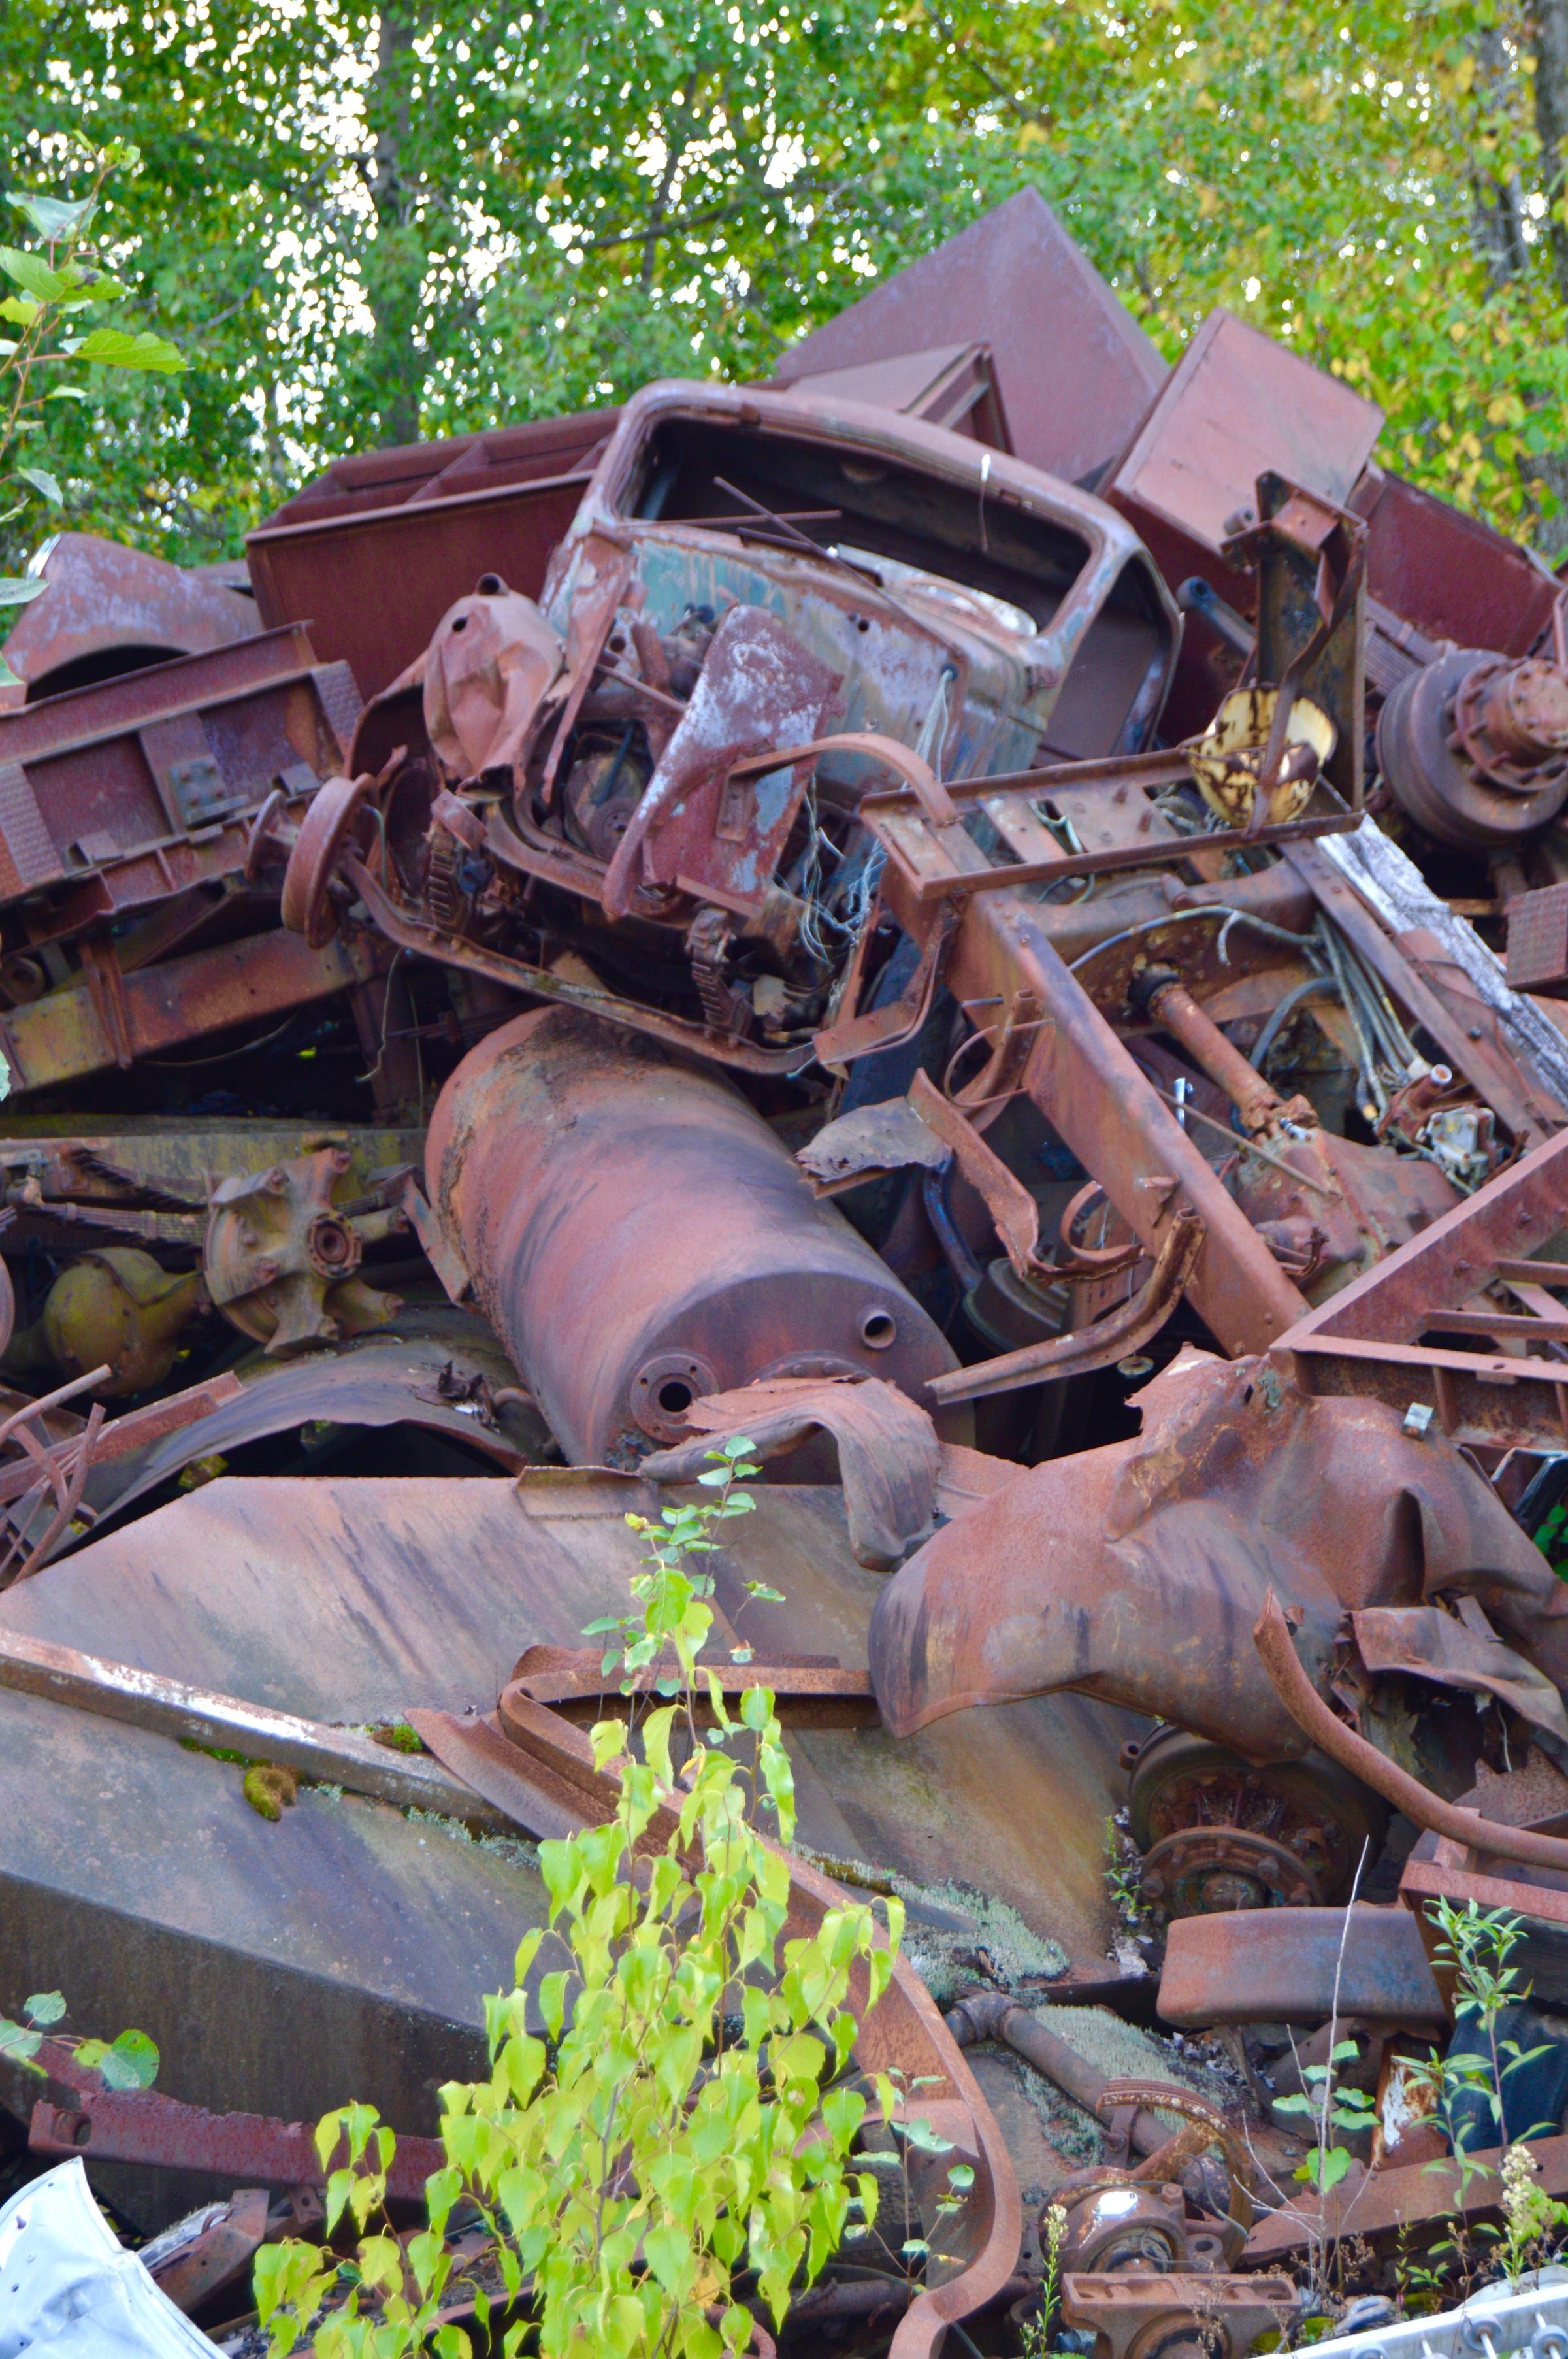 Rutland Scrap Yard Becomes Nirvana For Metal Artists | Vermont ...